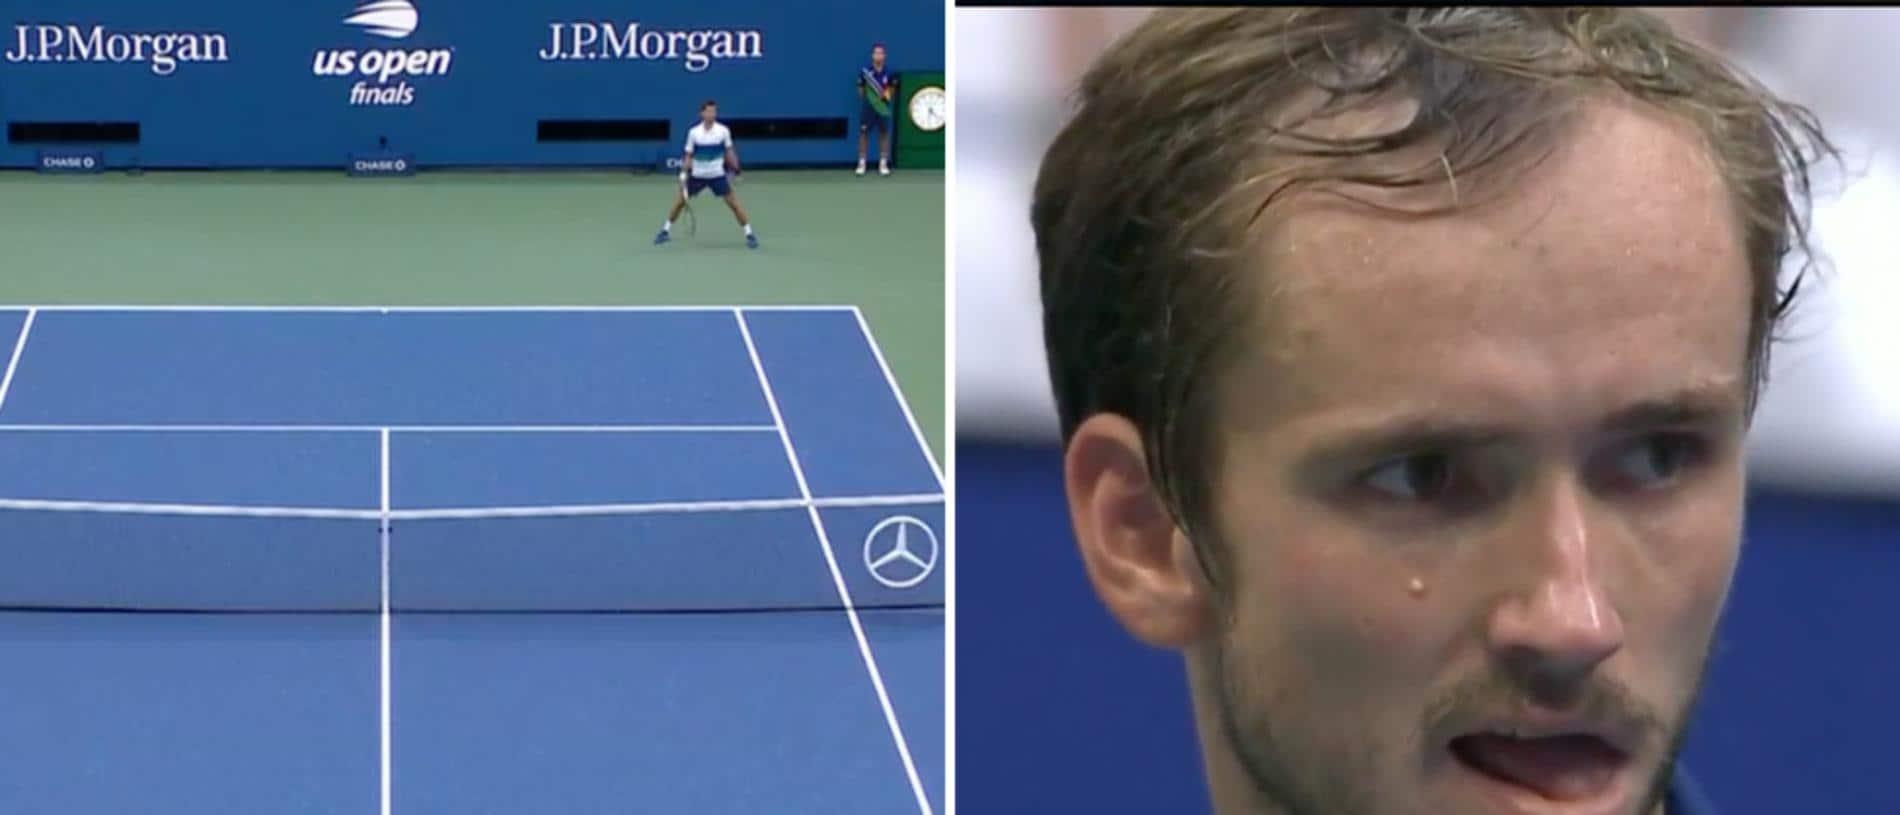 Daniil Medvedev is booed on match point.